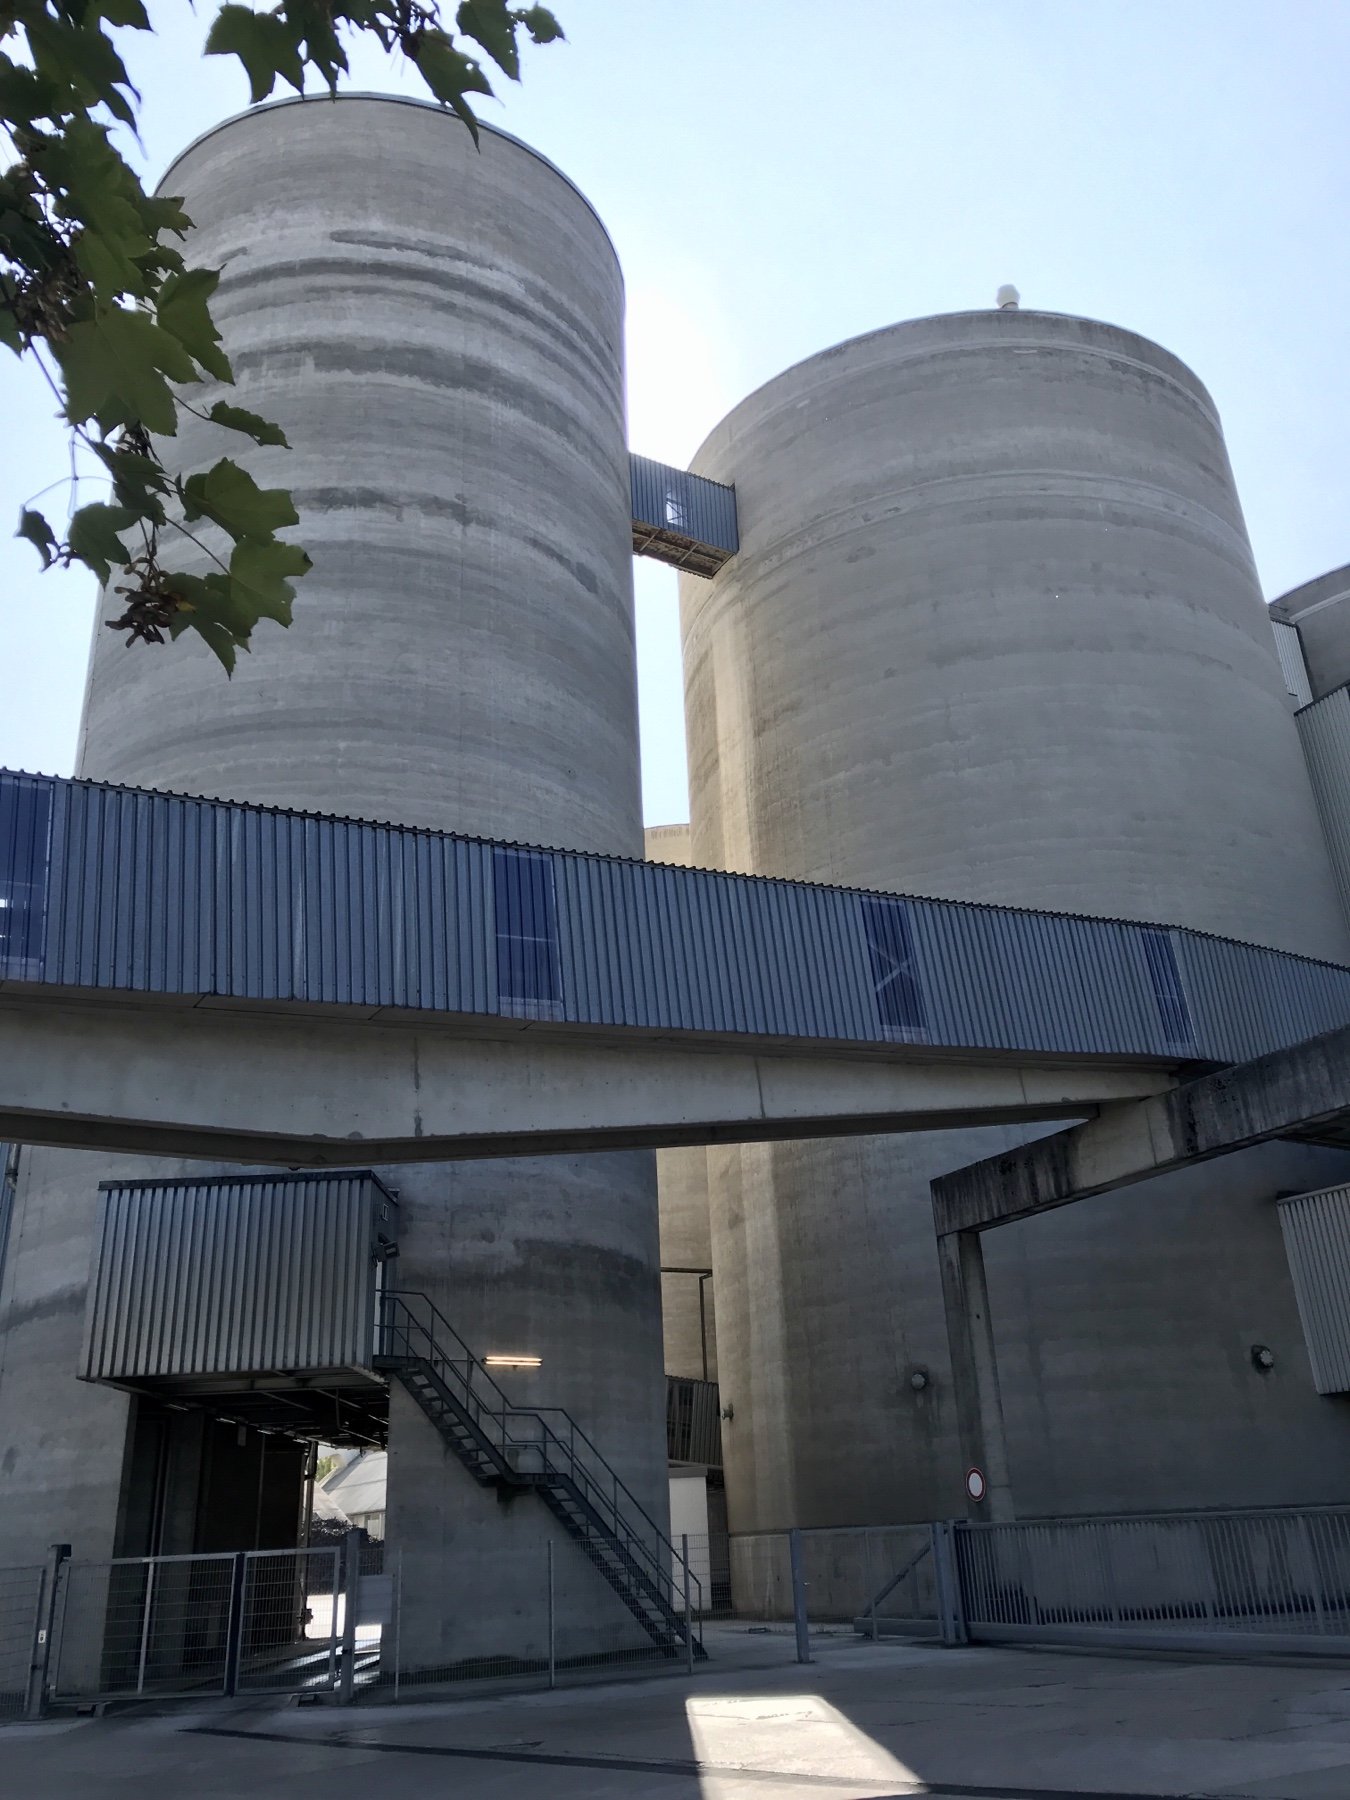 Kiesfabrik Harburg